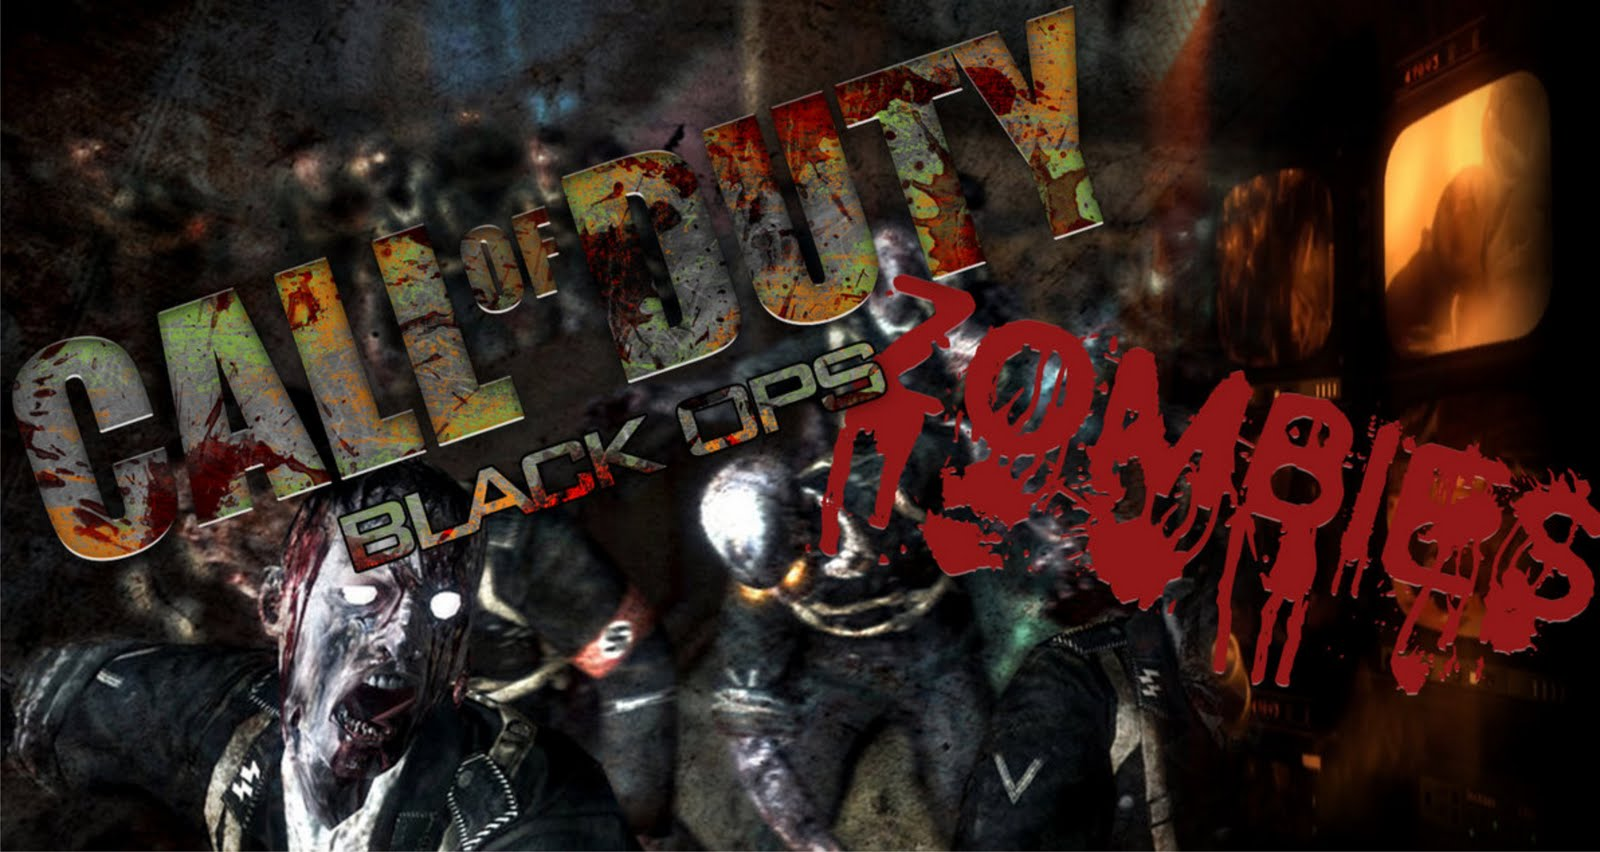 fond d'ecran anime black ops 2